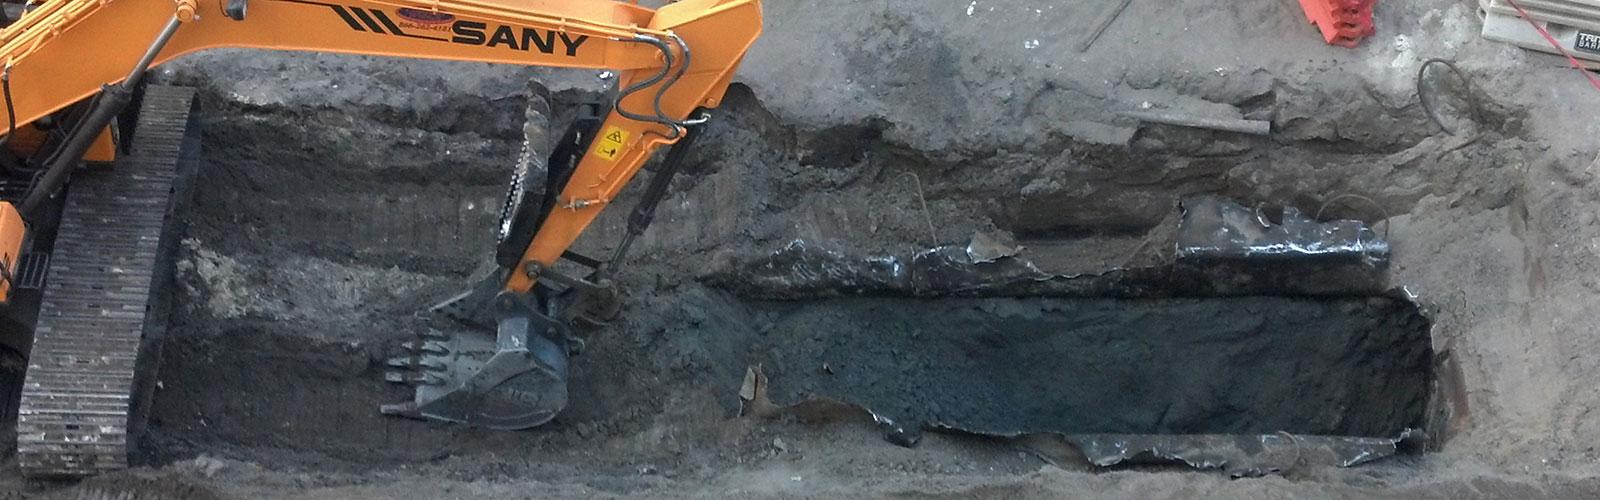 Digging Excavation